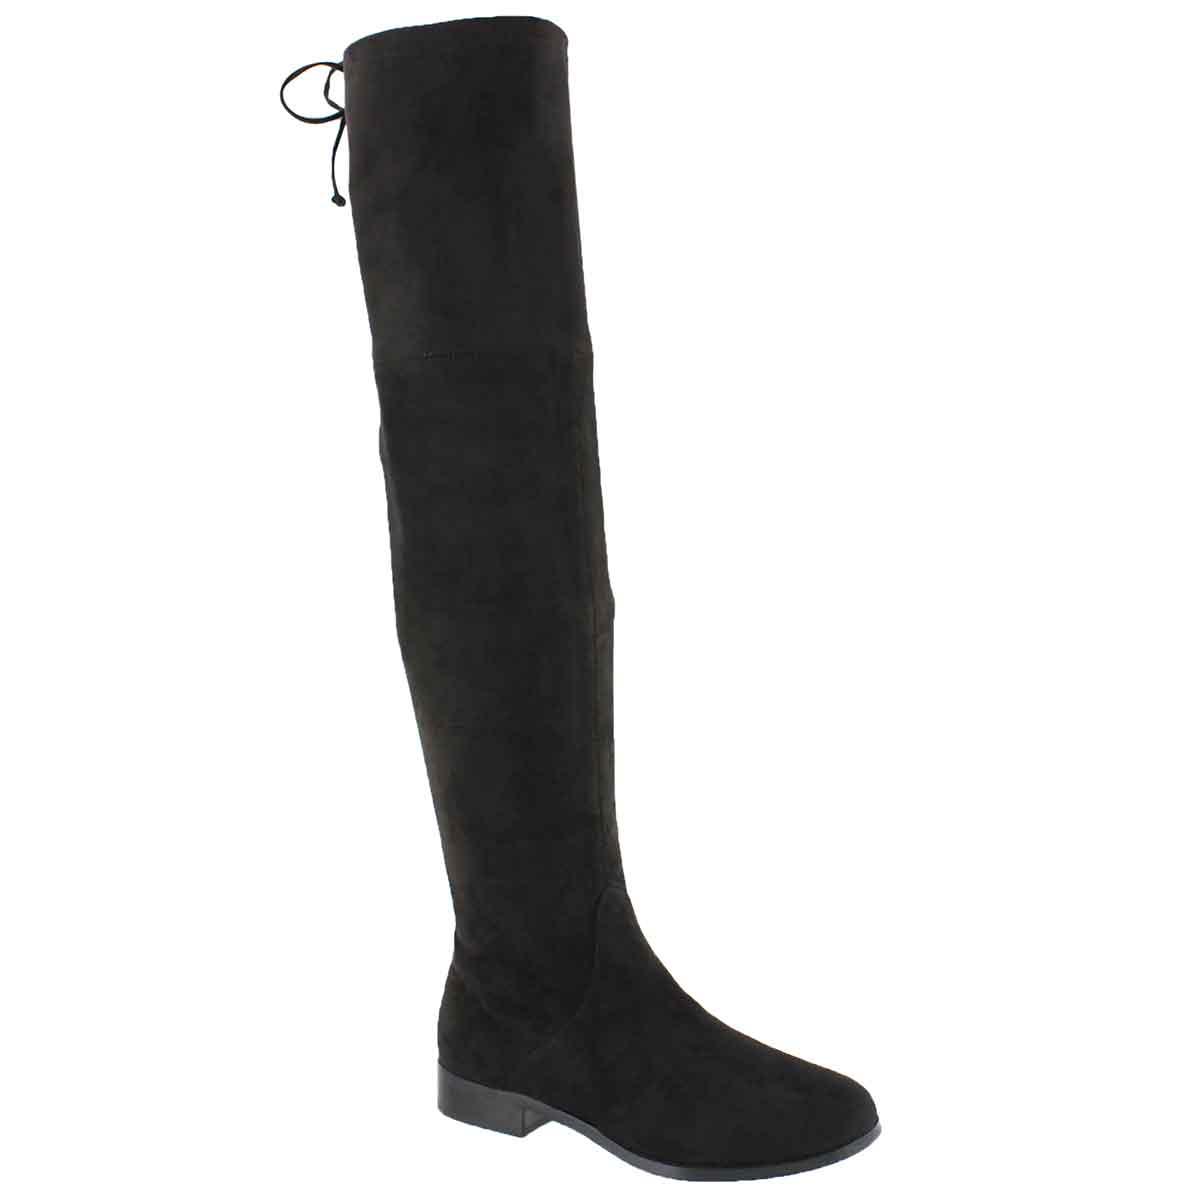 Women's DIDI black knee high boots